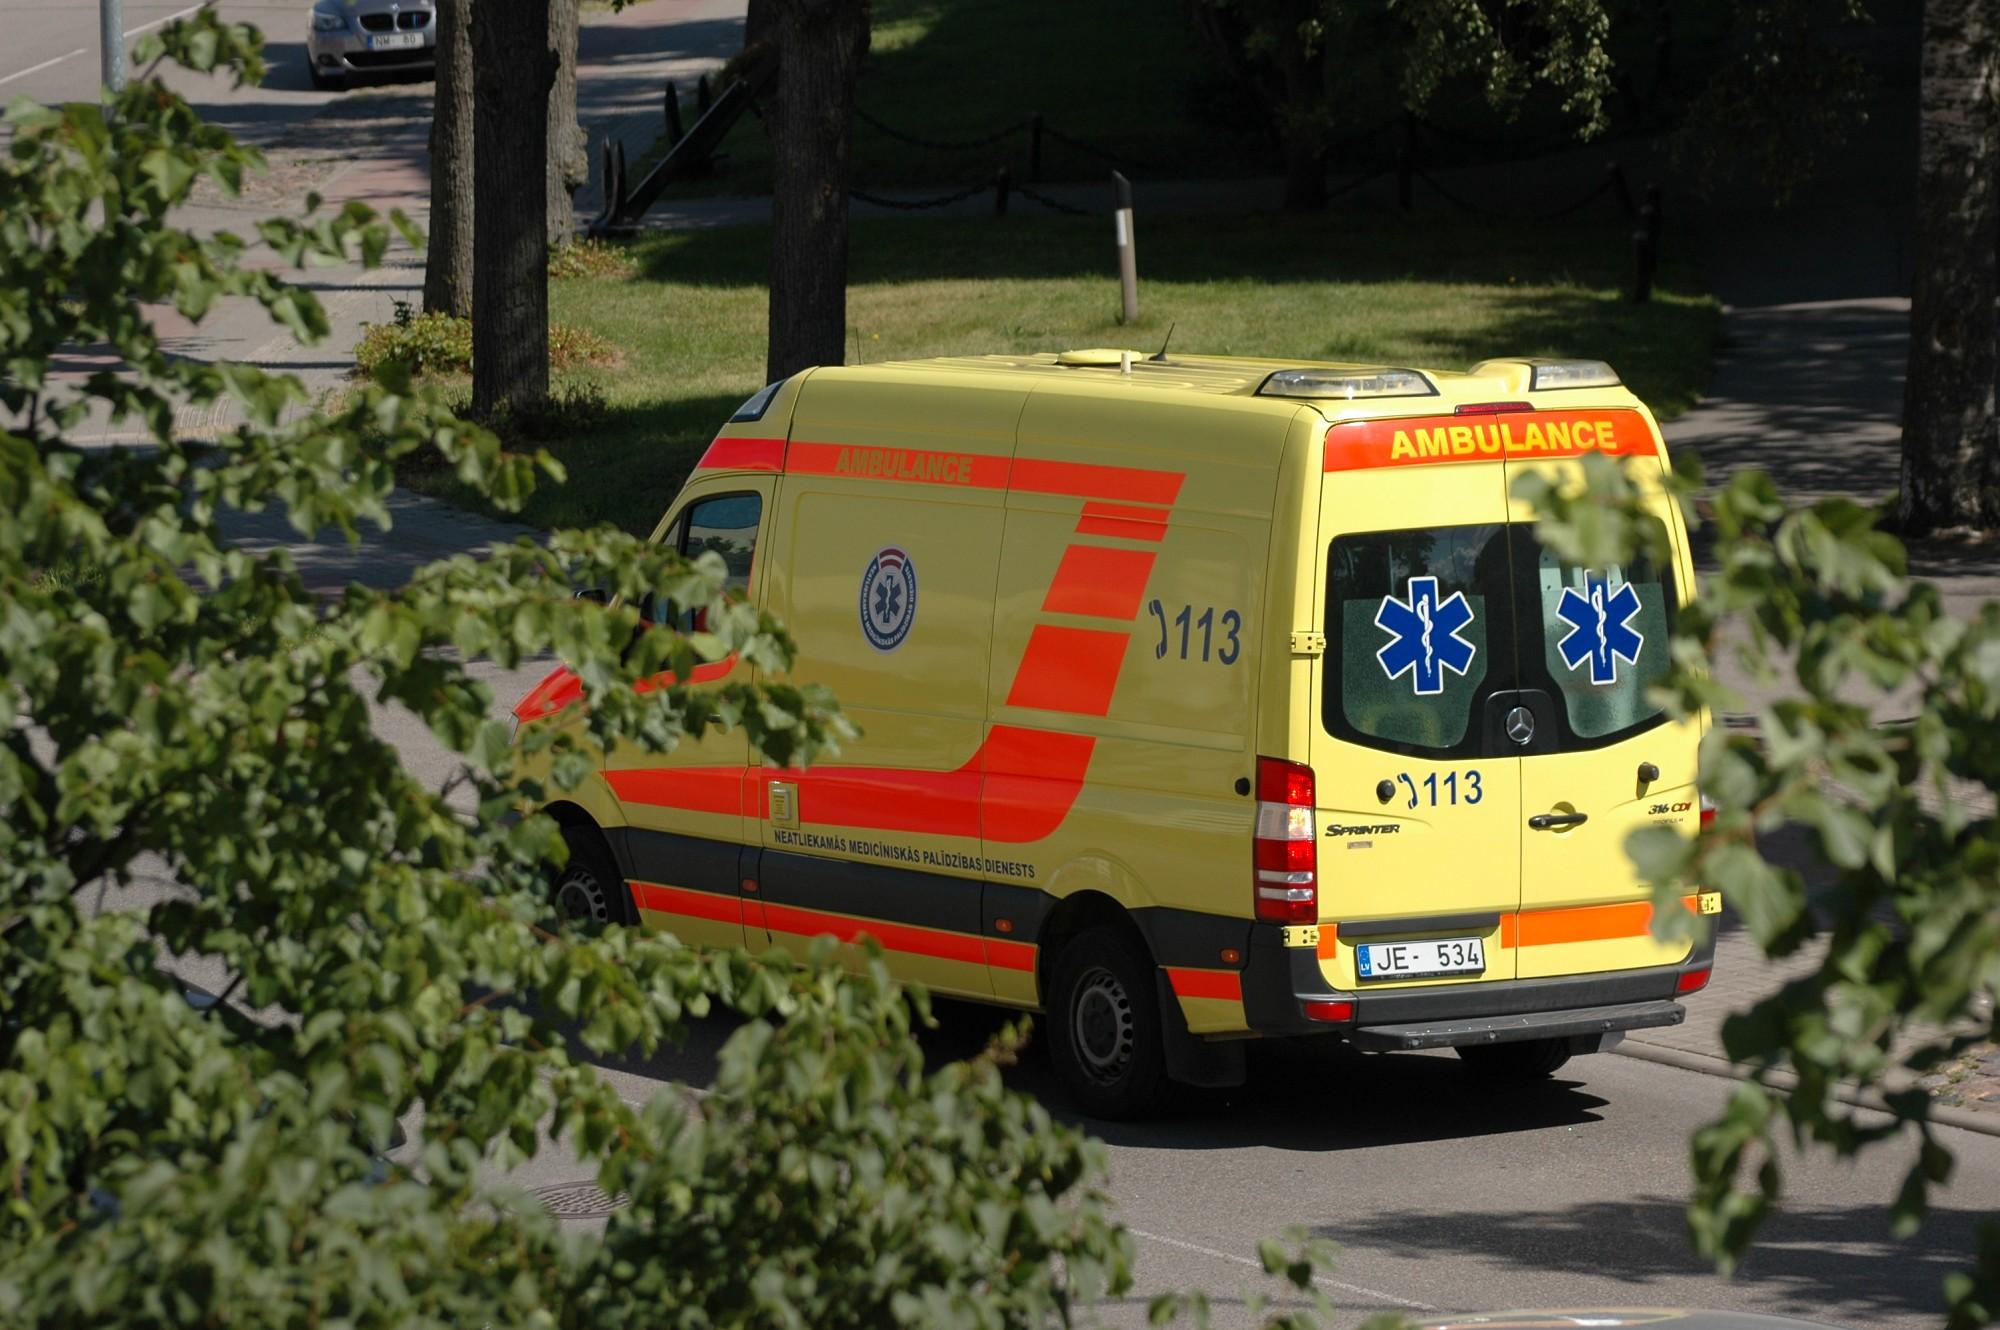 Autobusam strauji bremzējot, traumas guvis iereibis pasažieris